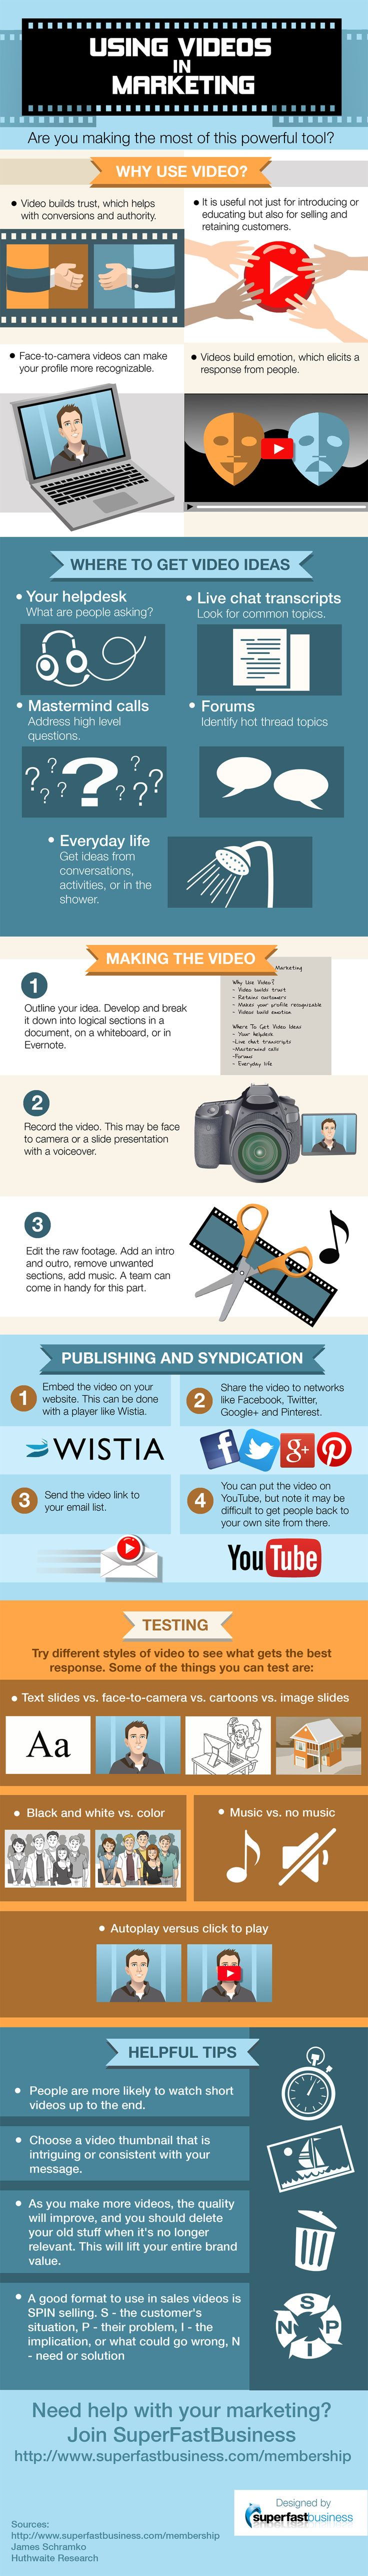 Insider Tips and Tricks for Creating a Killer Explainer Video - #infographic #VideoMarketing